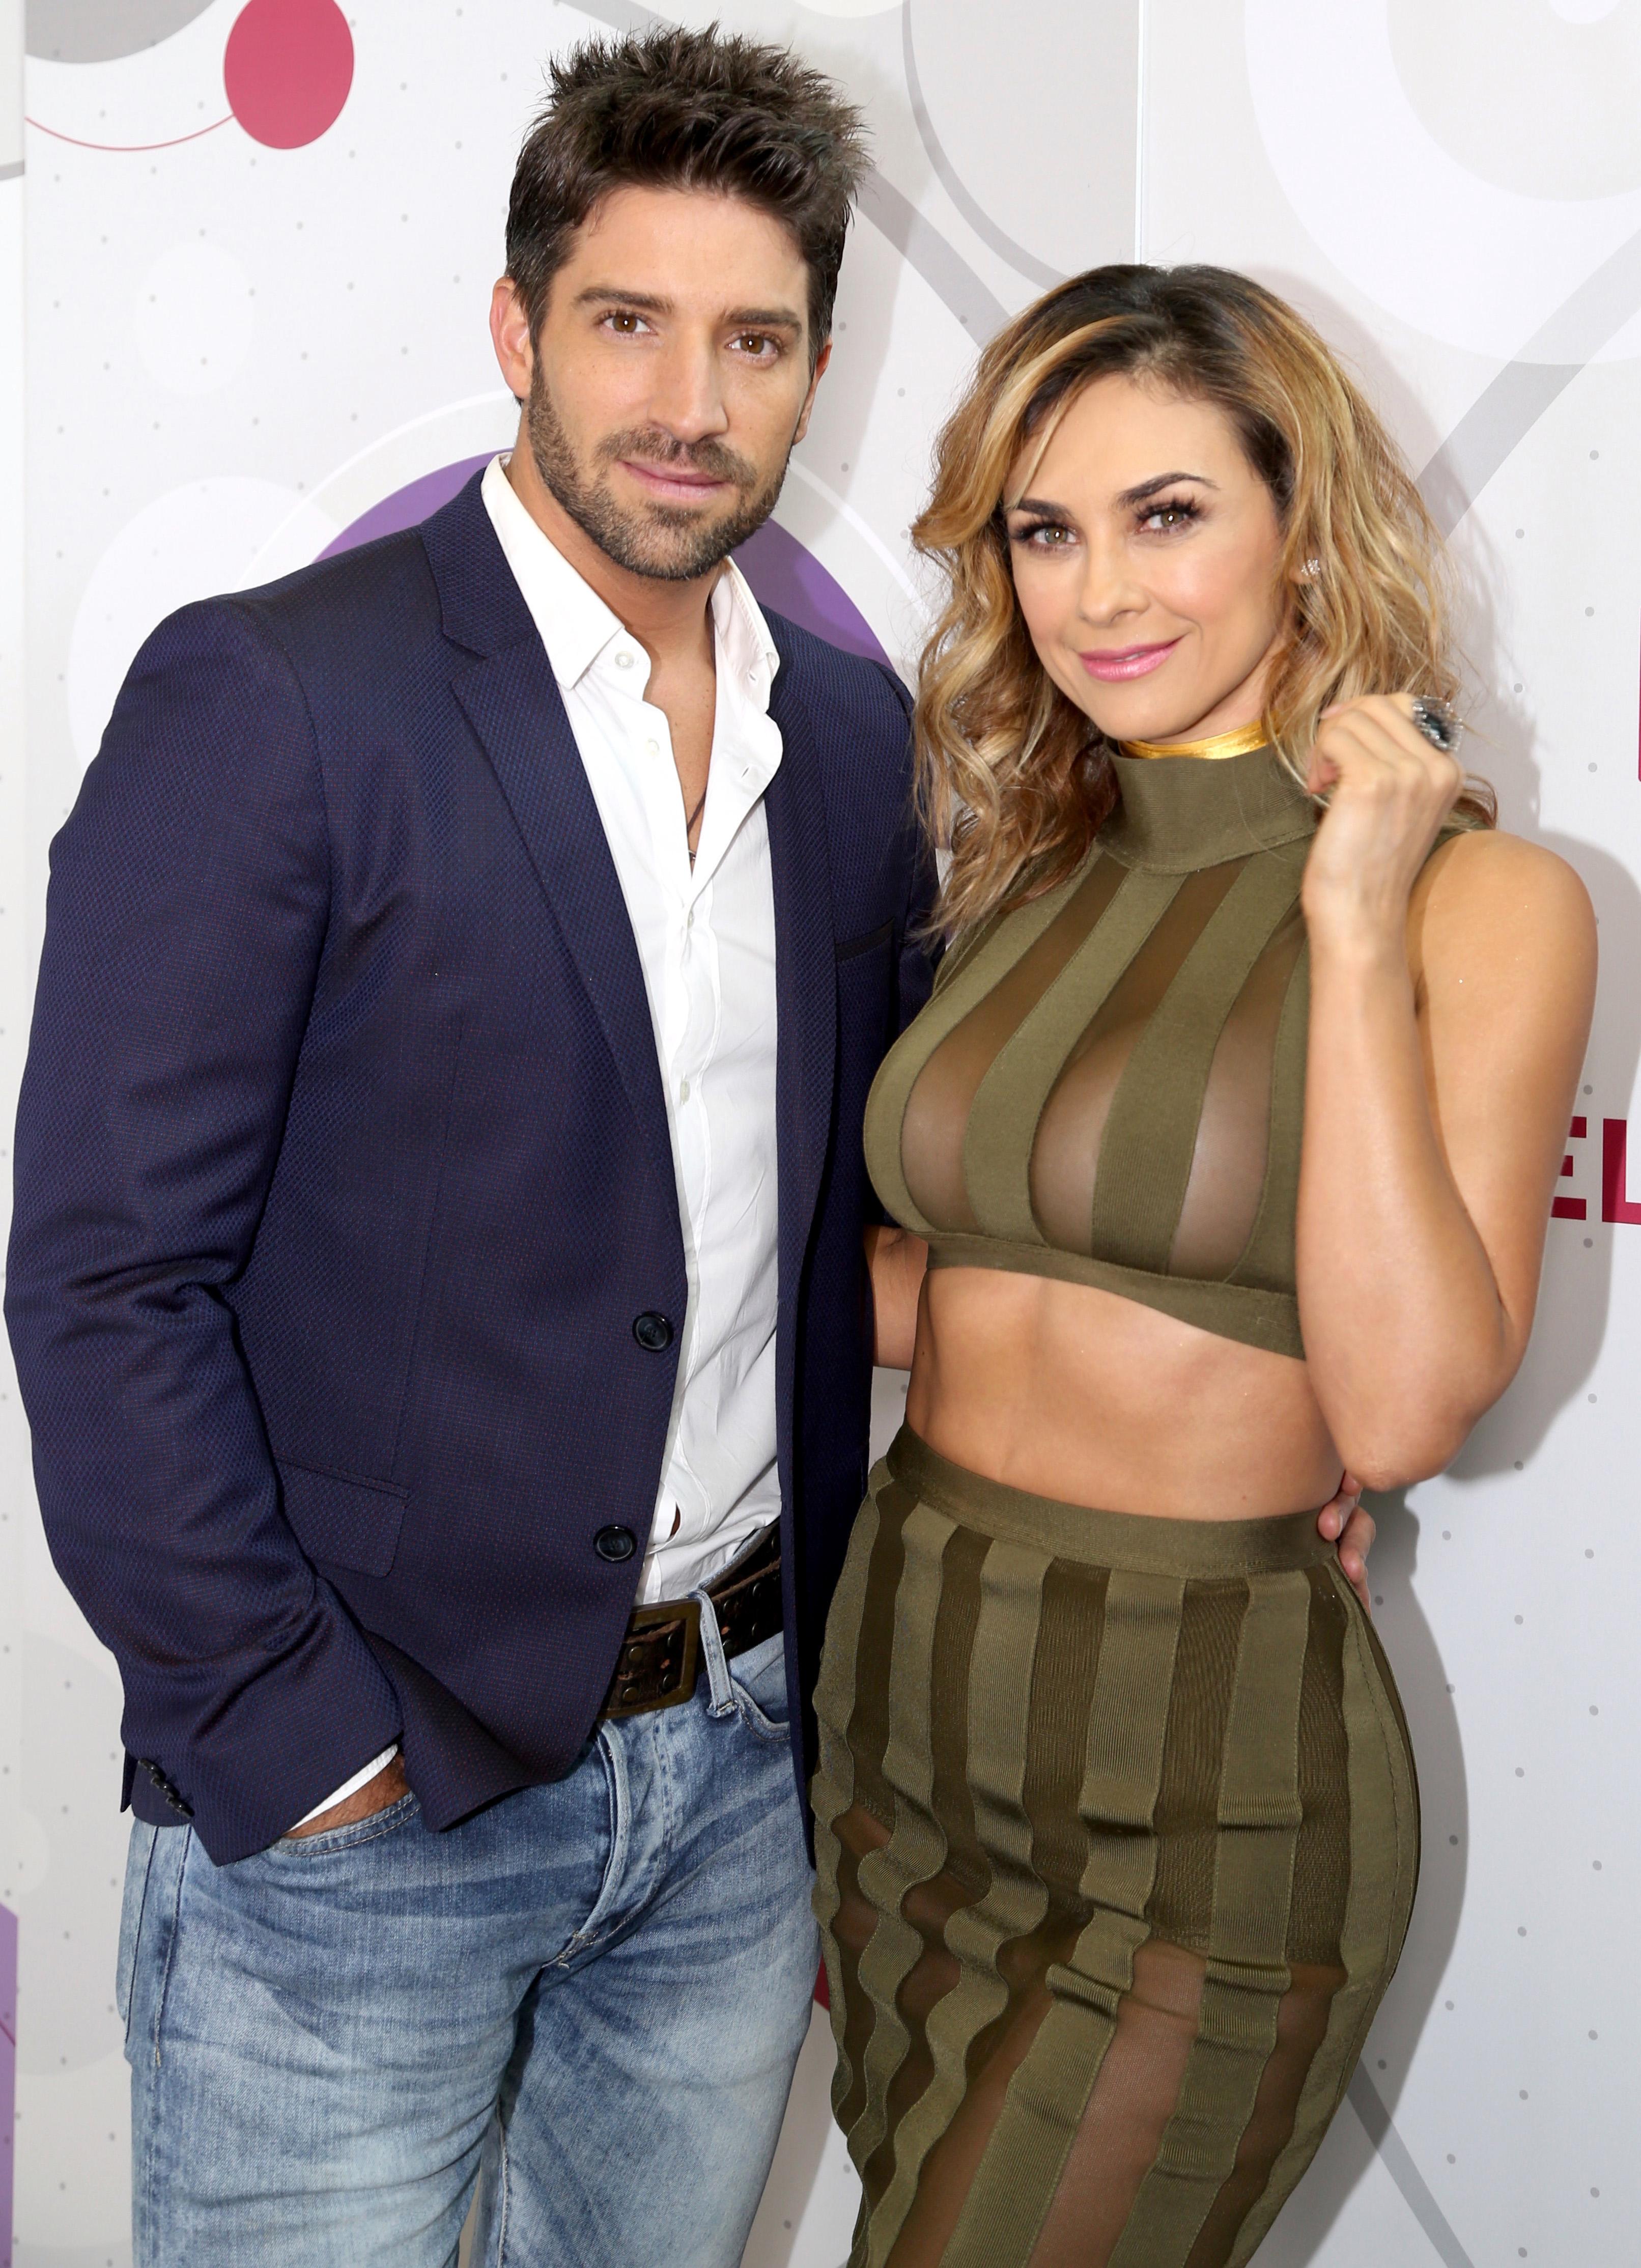 Aracely Arámbula and David Chocarro at an event for La Doña (2016)